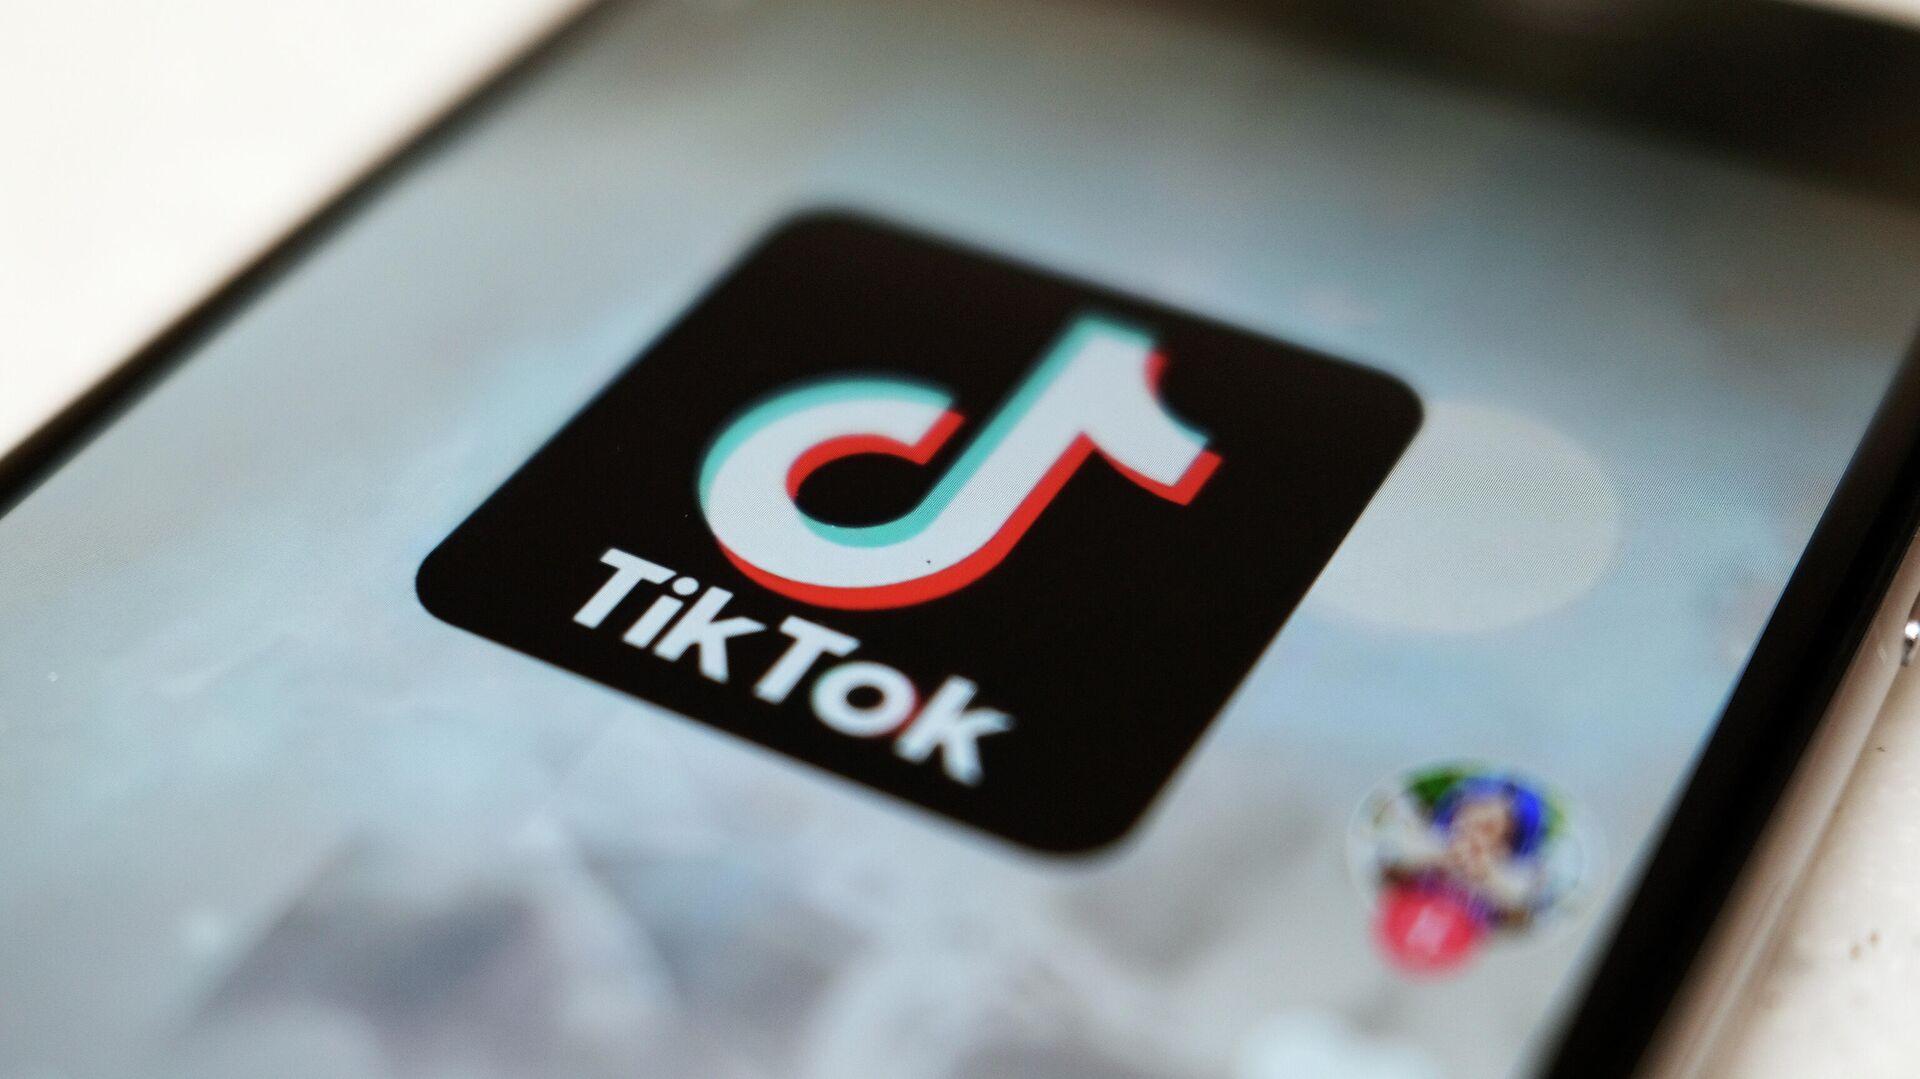 Логотип приложения TikTok на экране смартфона - РИА Новости, 1920, 07.04.2021